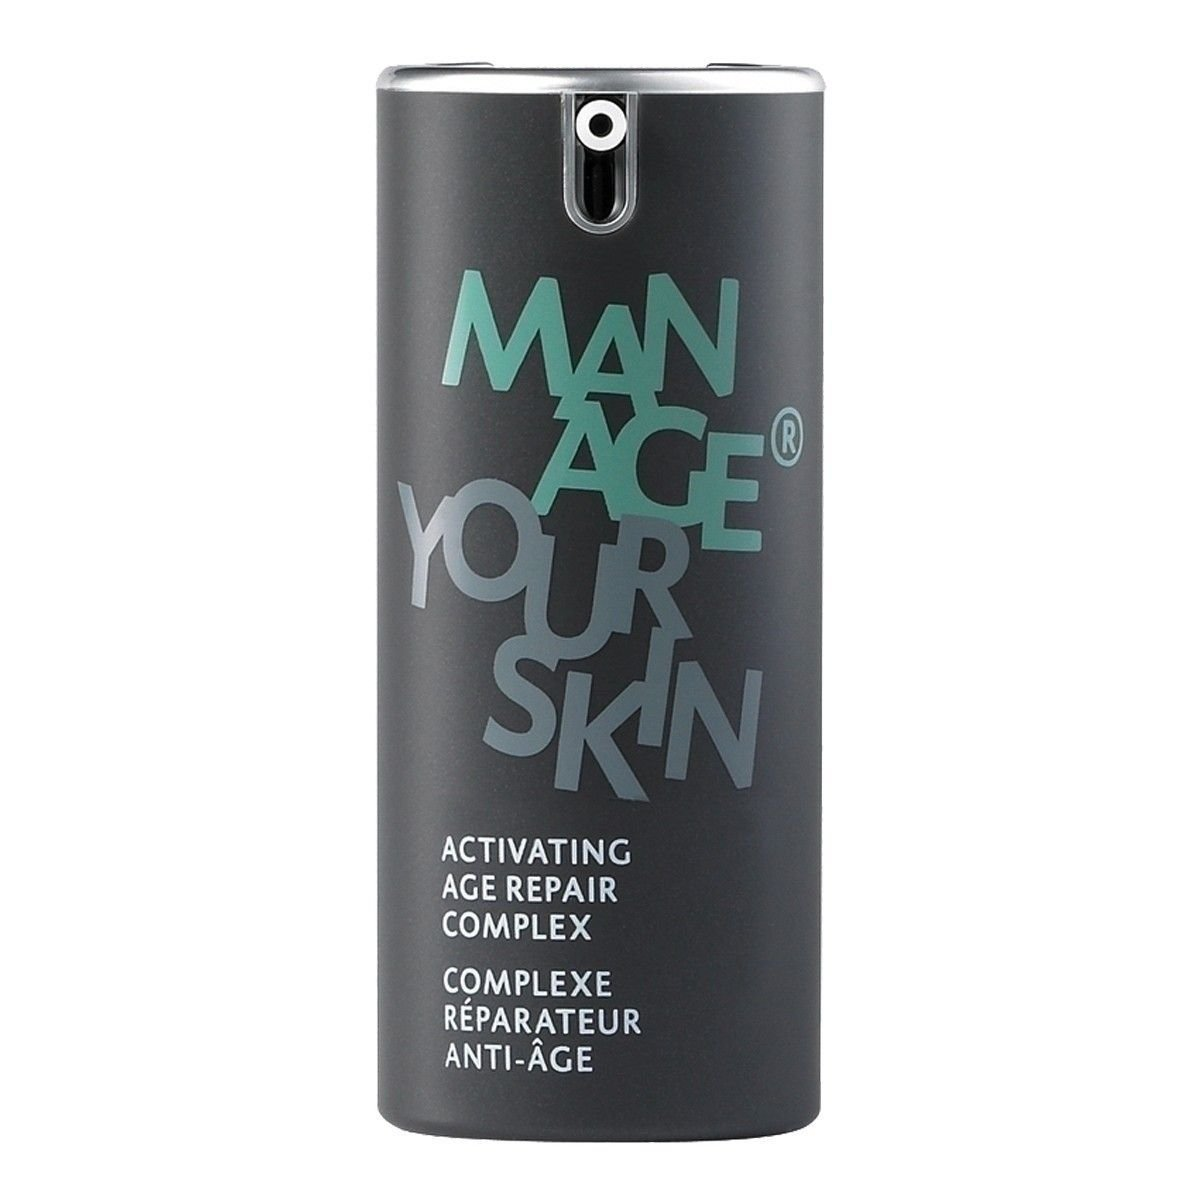 Afbeelding van Dr. Spiller Activating Age Repair Complex Manage your skin Mannen